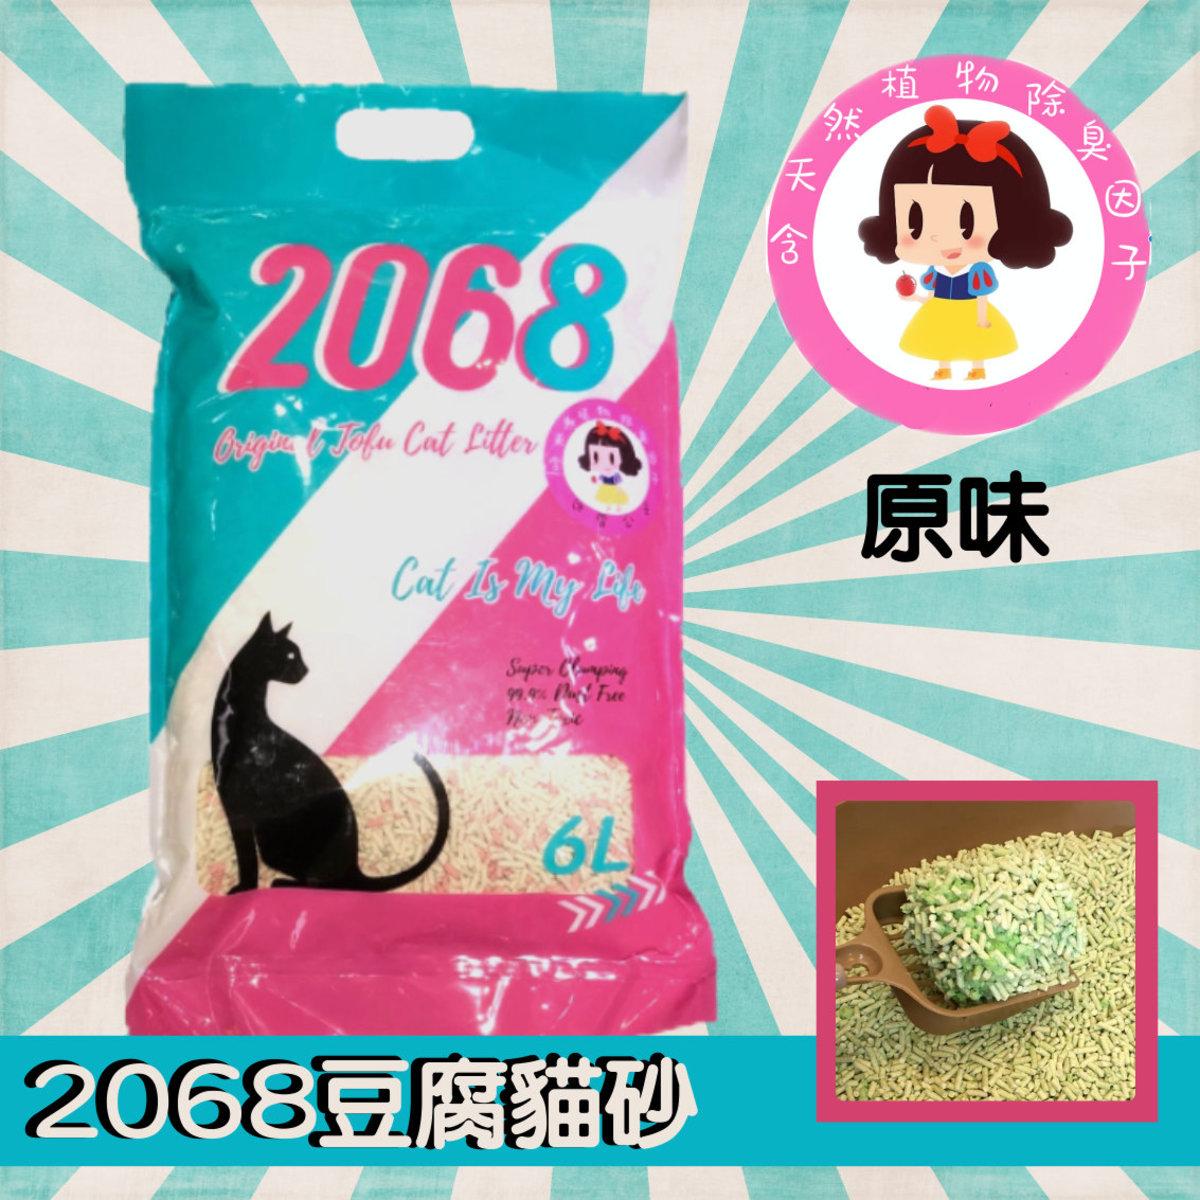 Princess Tofu Cat Litter (original flavor)